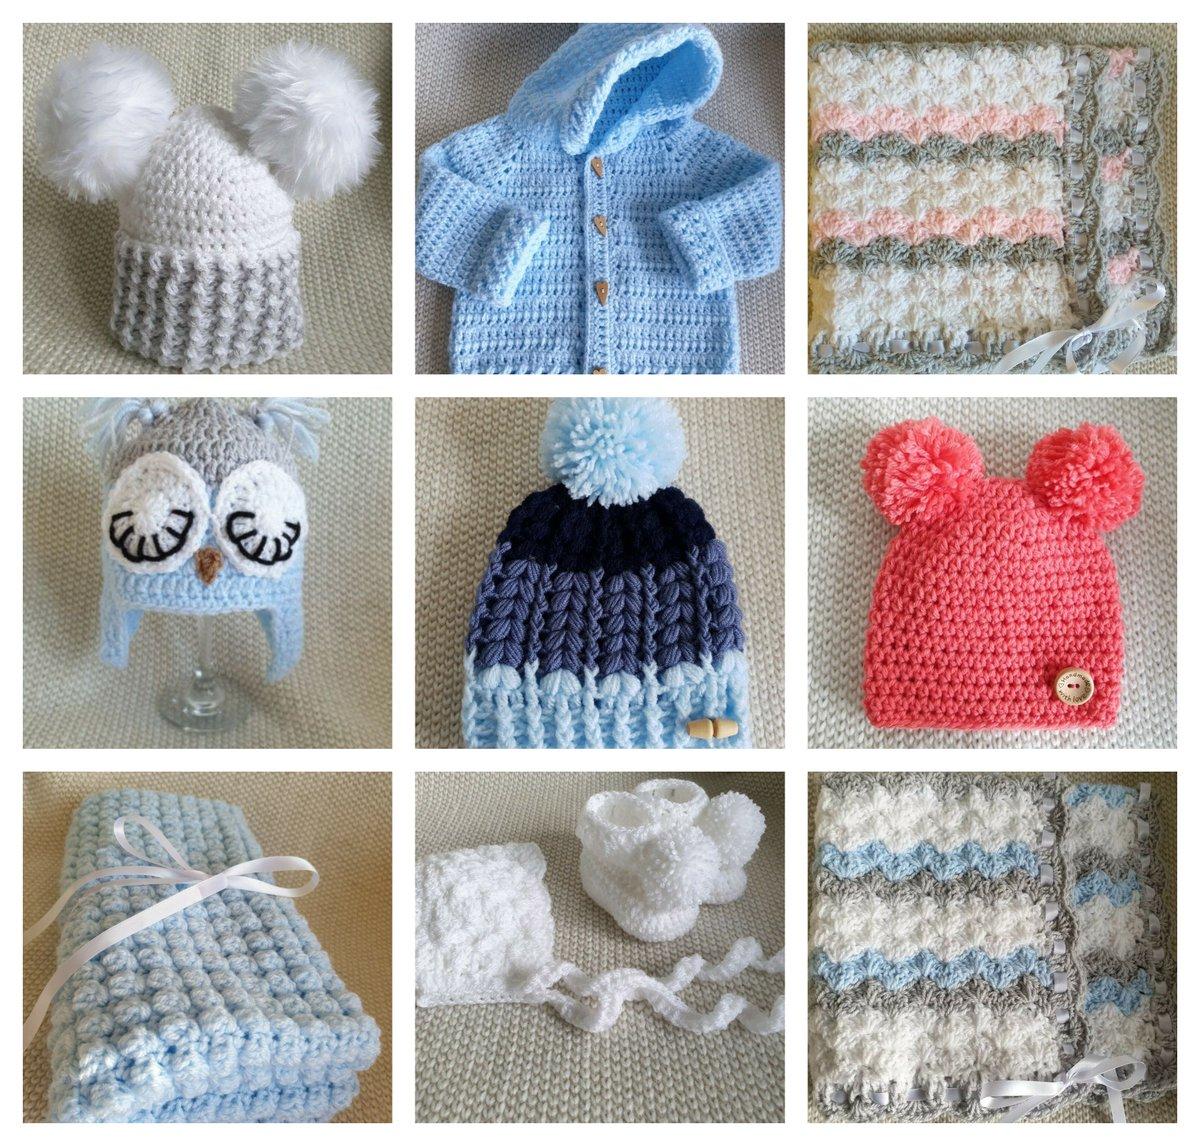 Good morning #UKGiftAM #ukgiftam Just a few of my handmade #baby items in stock. 👇👇👇👇